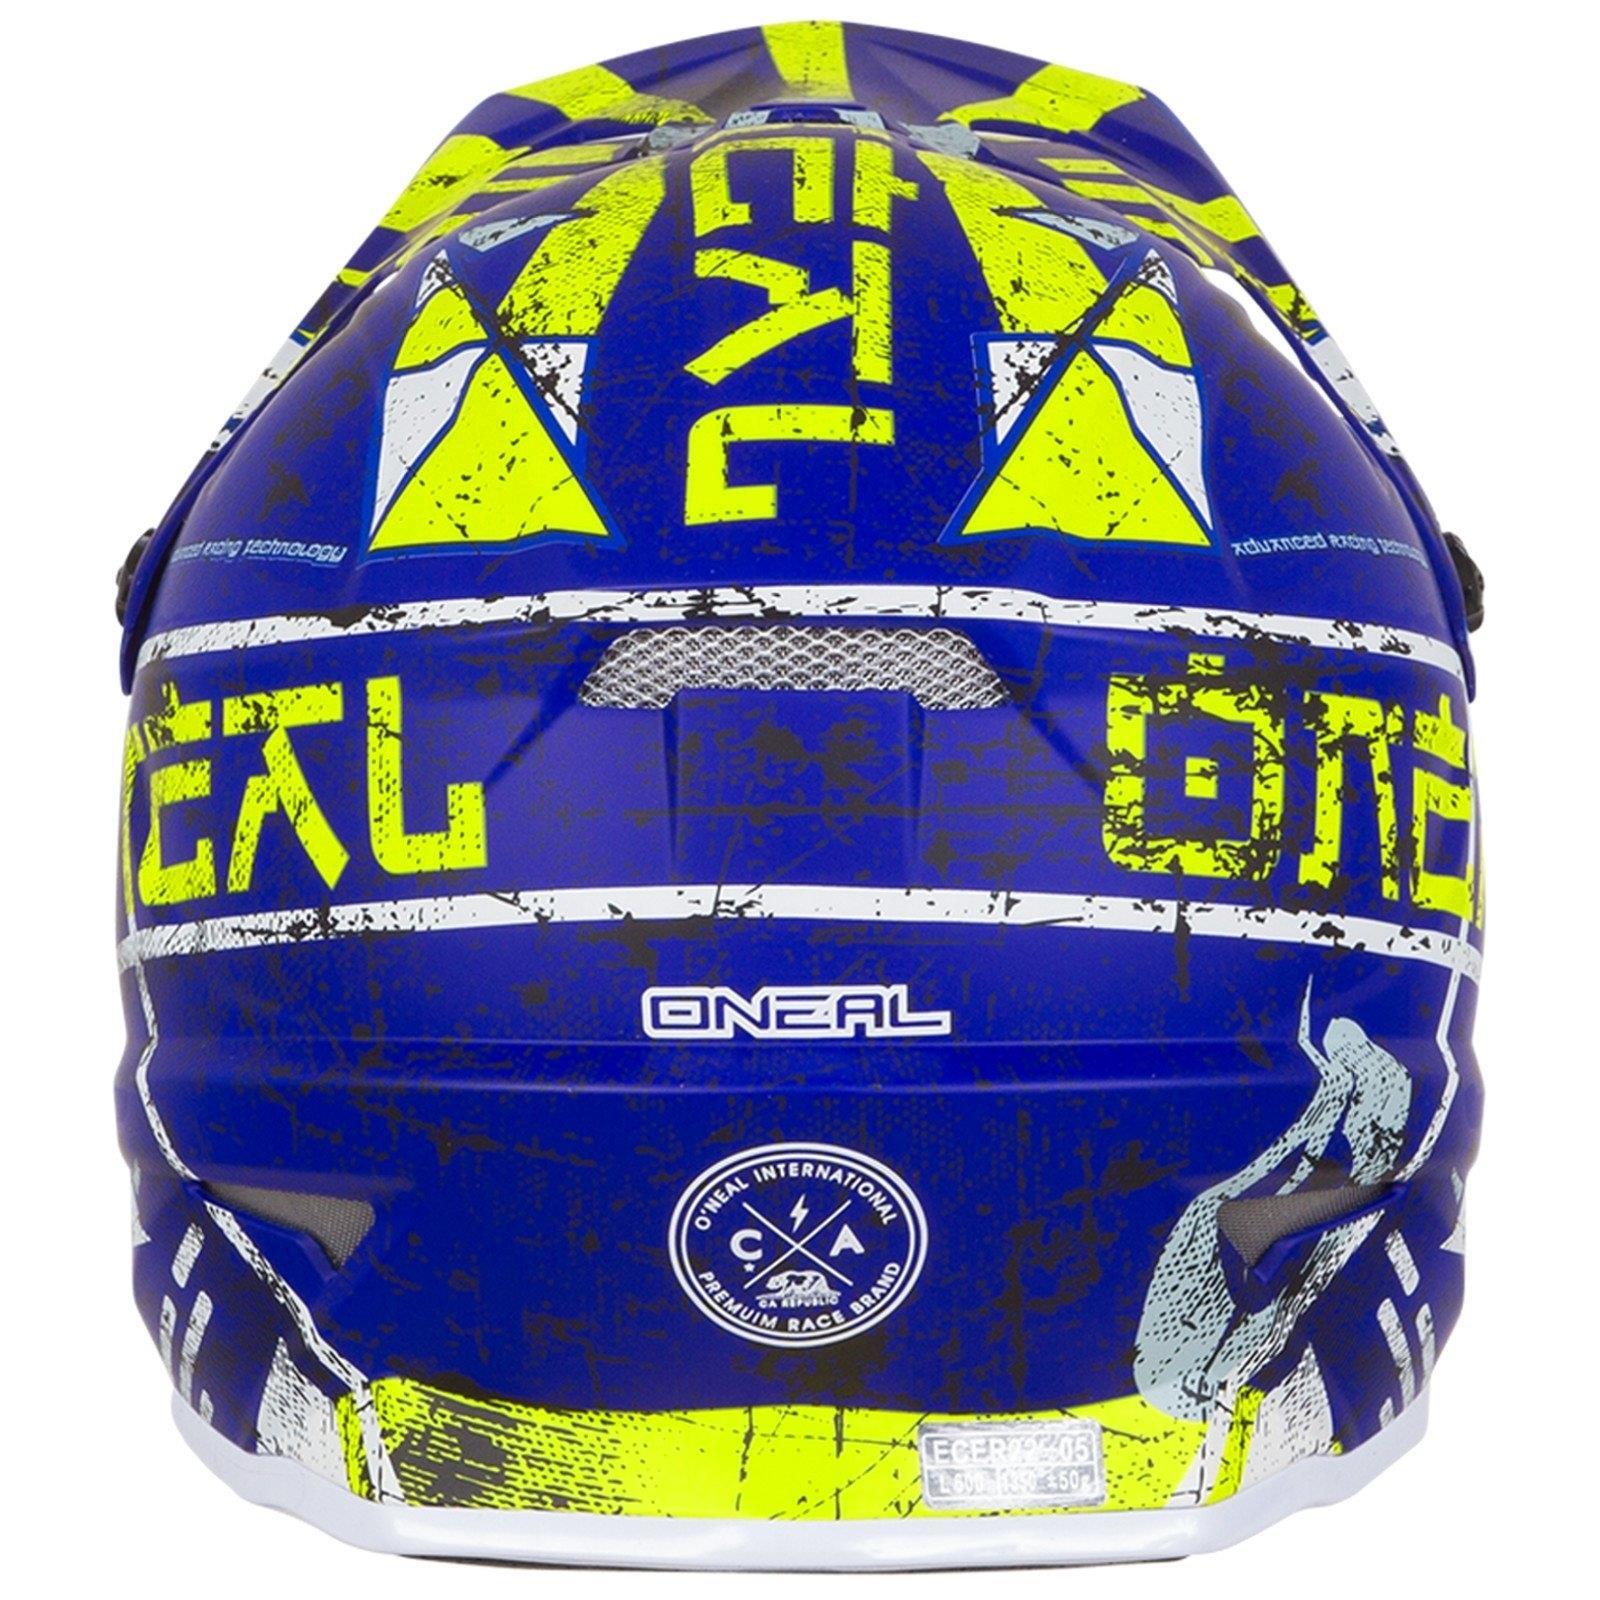 ONeal-Motocross-casco-MX-ENDURO-MOTO-BICI-FUORISTRADA-CROSS-Series-Adventure miniatura 23